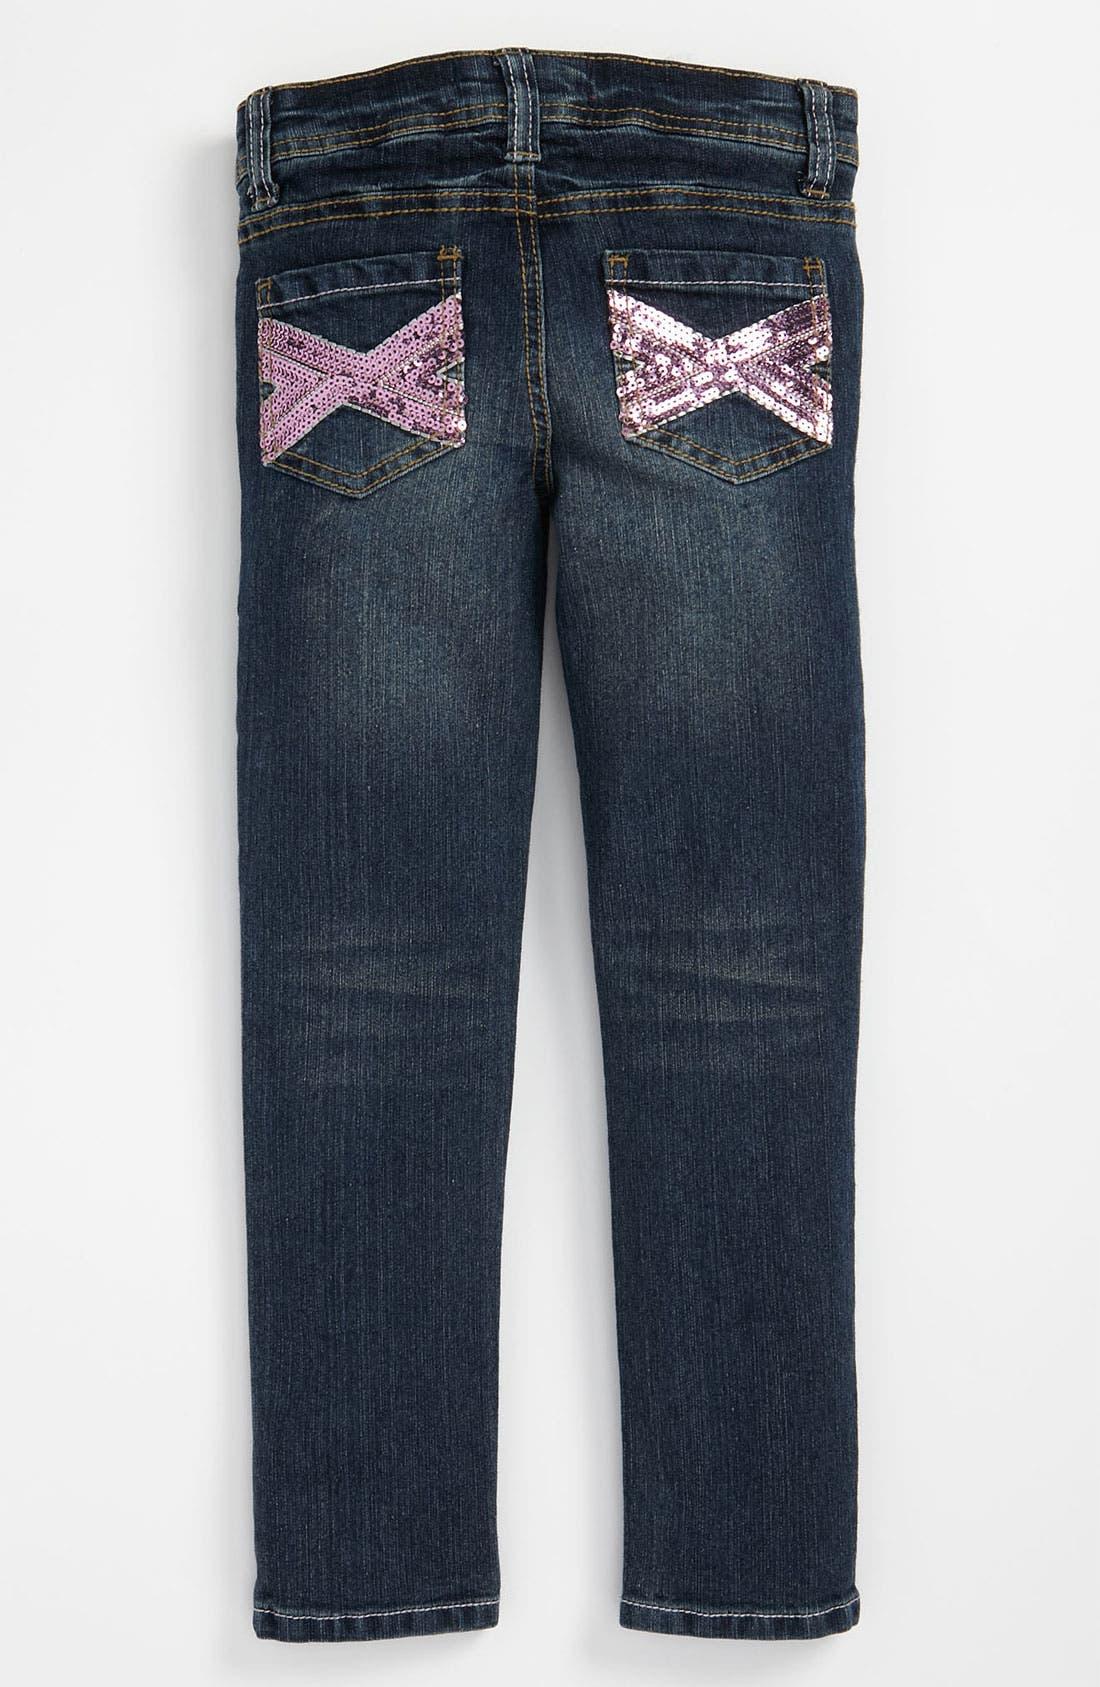 Alternate Image 1 Selected - Freestyle Revolution Sequin Skinny Jeans (Little Girls)